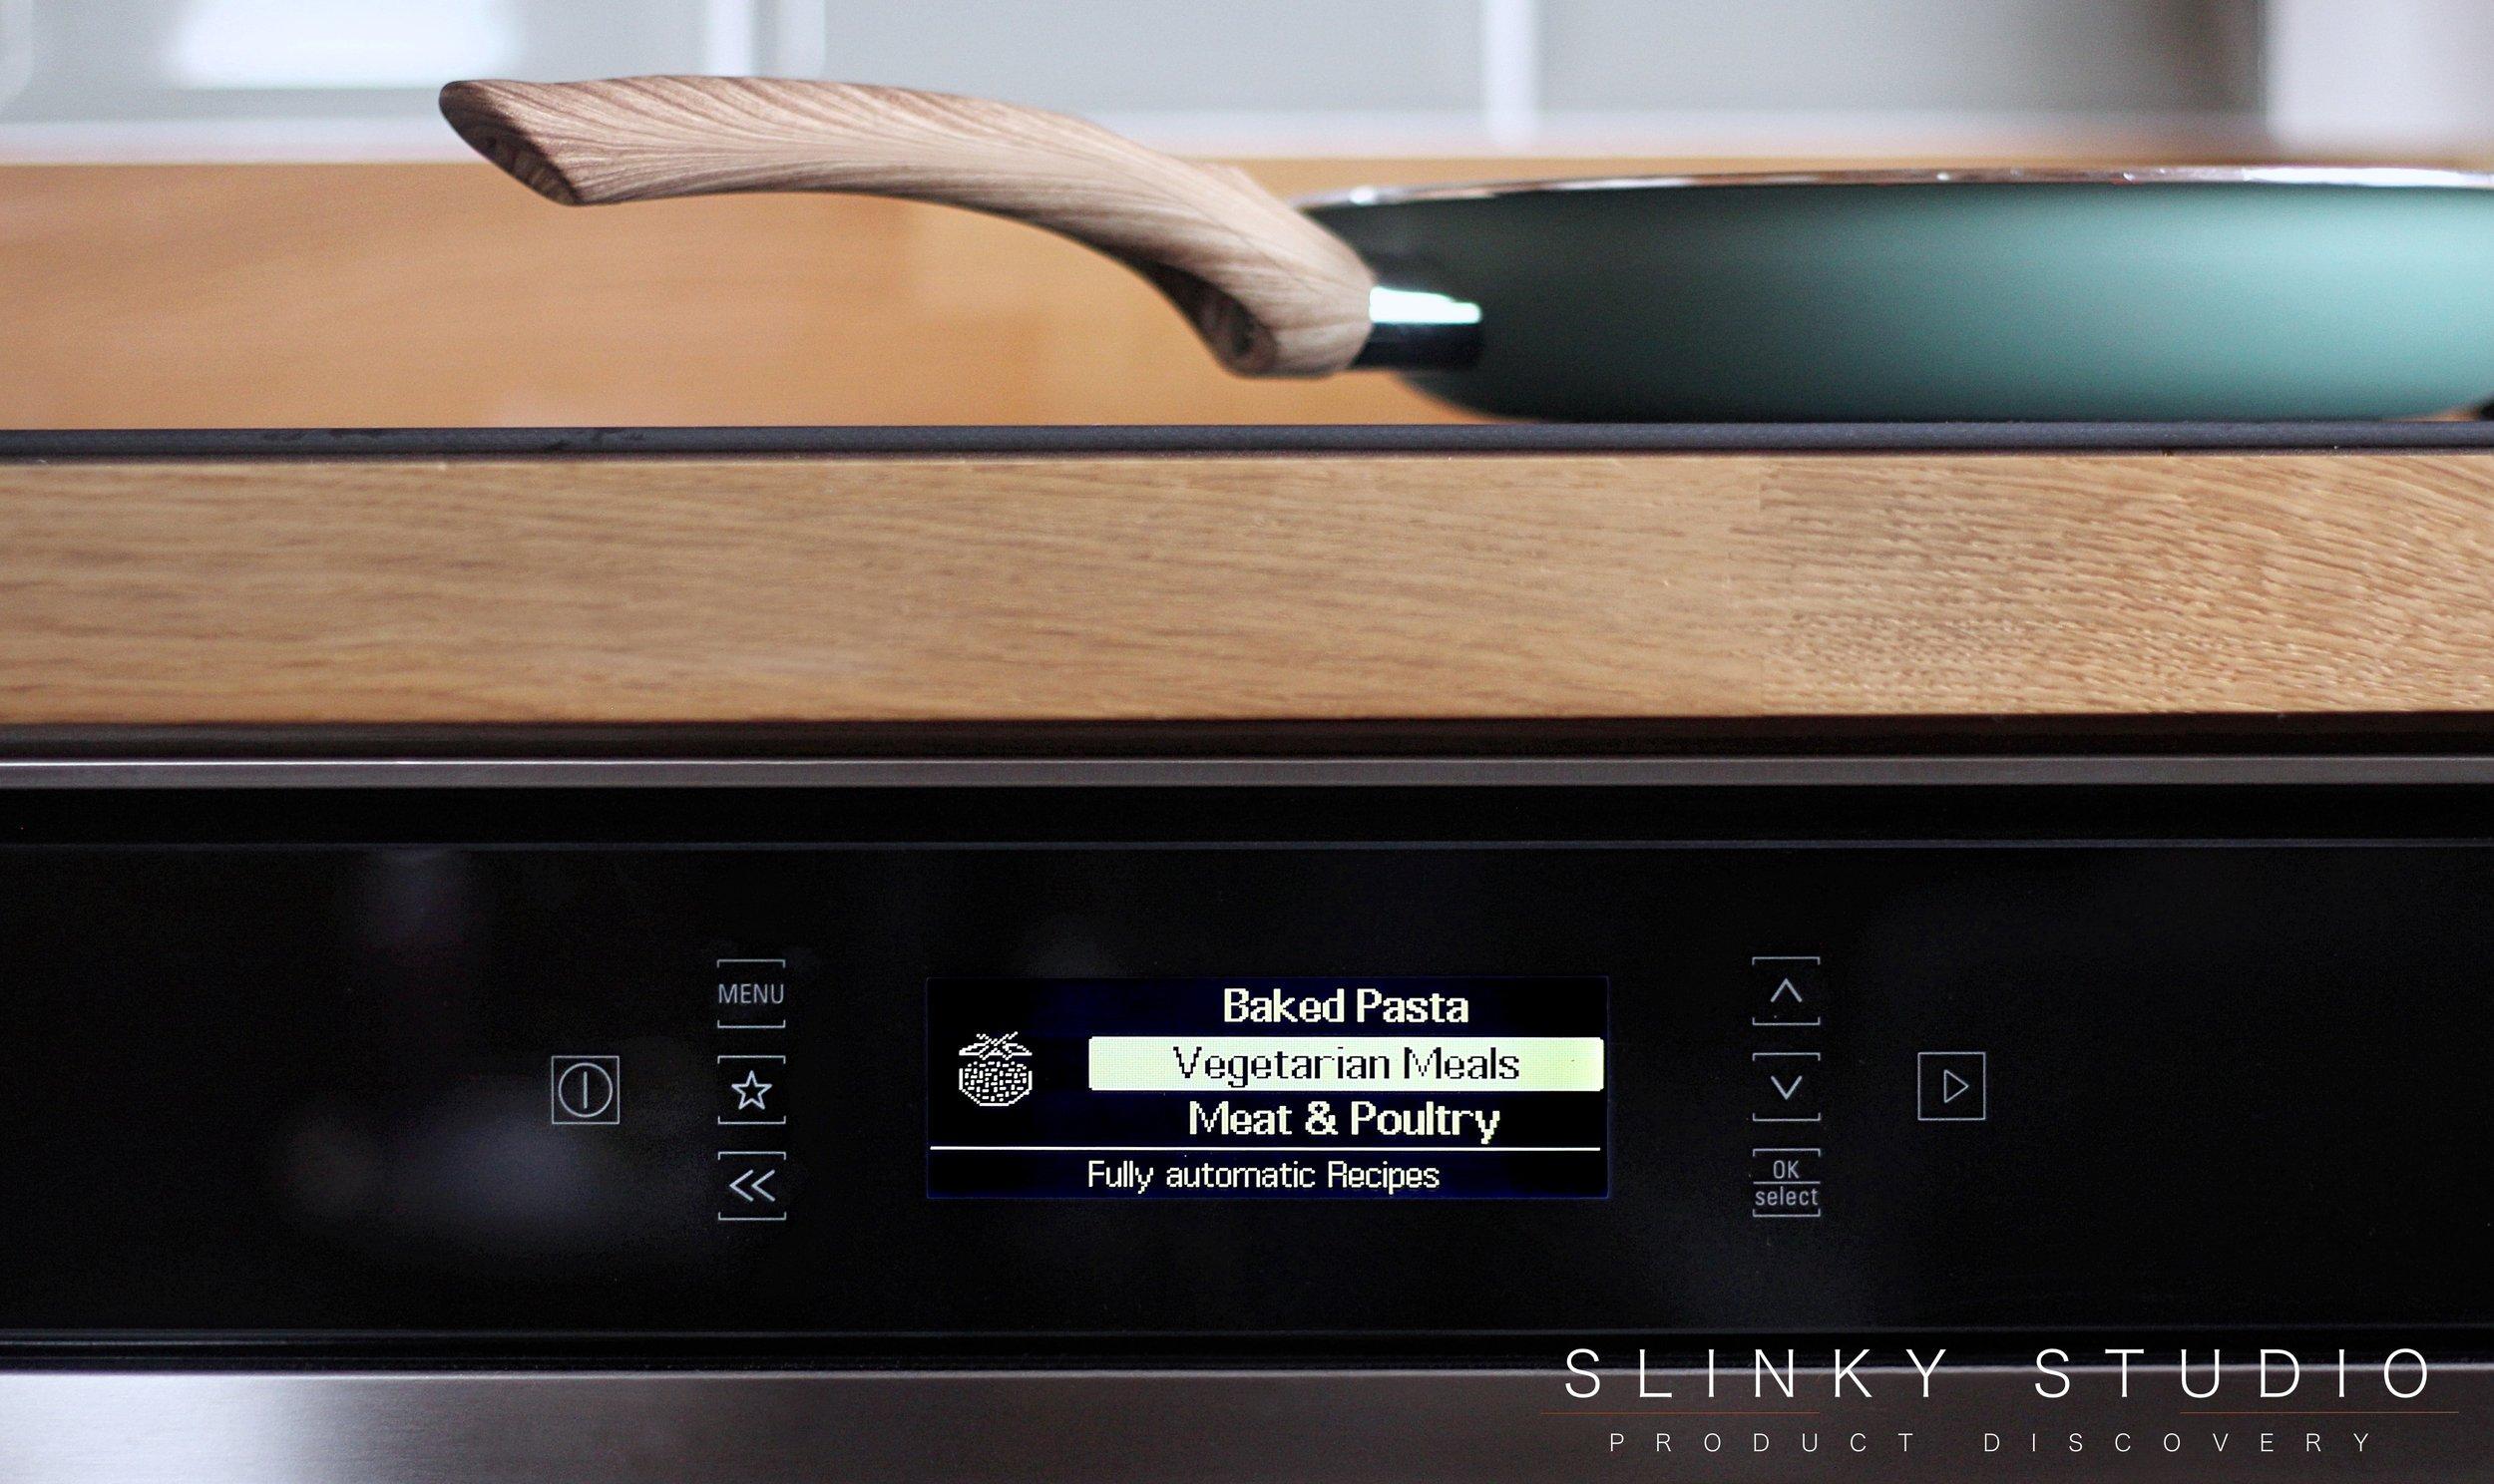 Hotpoint Class 9 SI9 891 SP IX Oven Touch Controls Vegetarian Mode.jpg